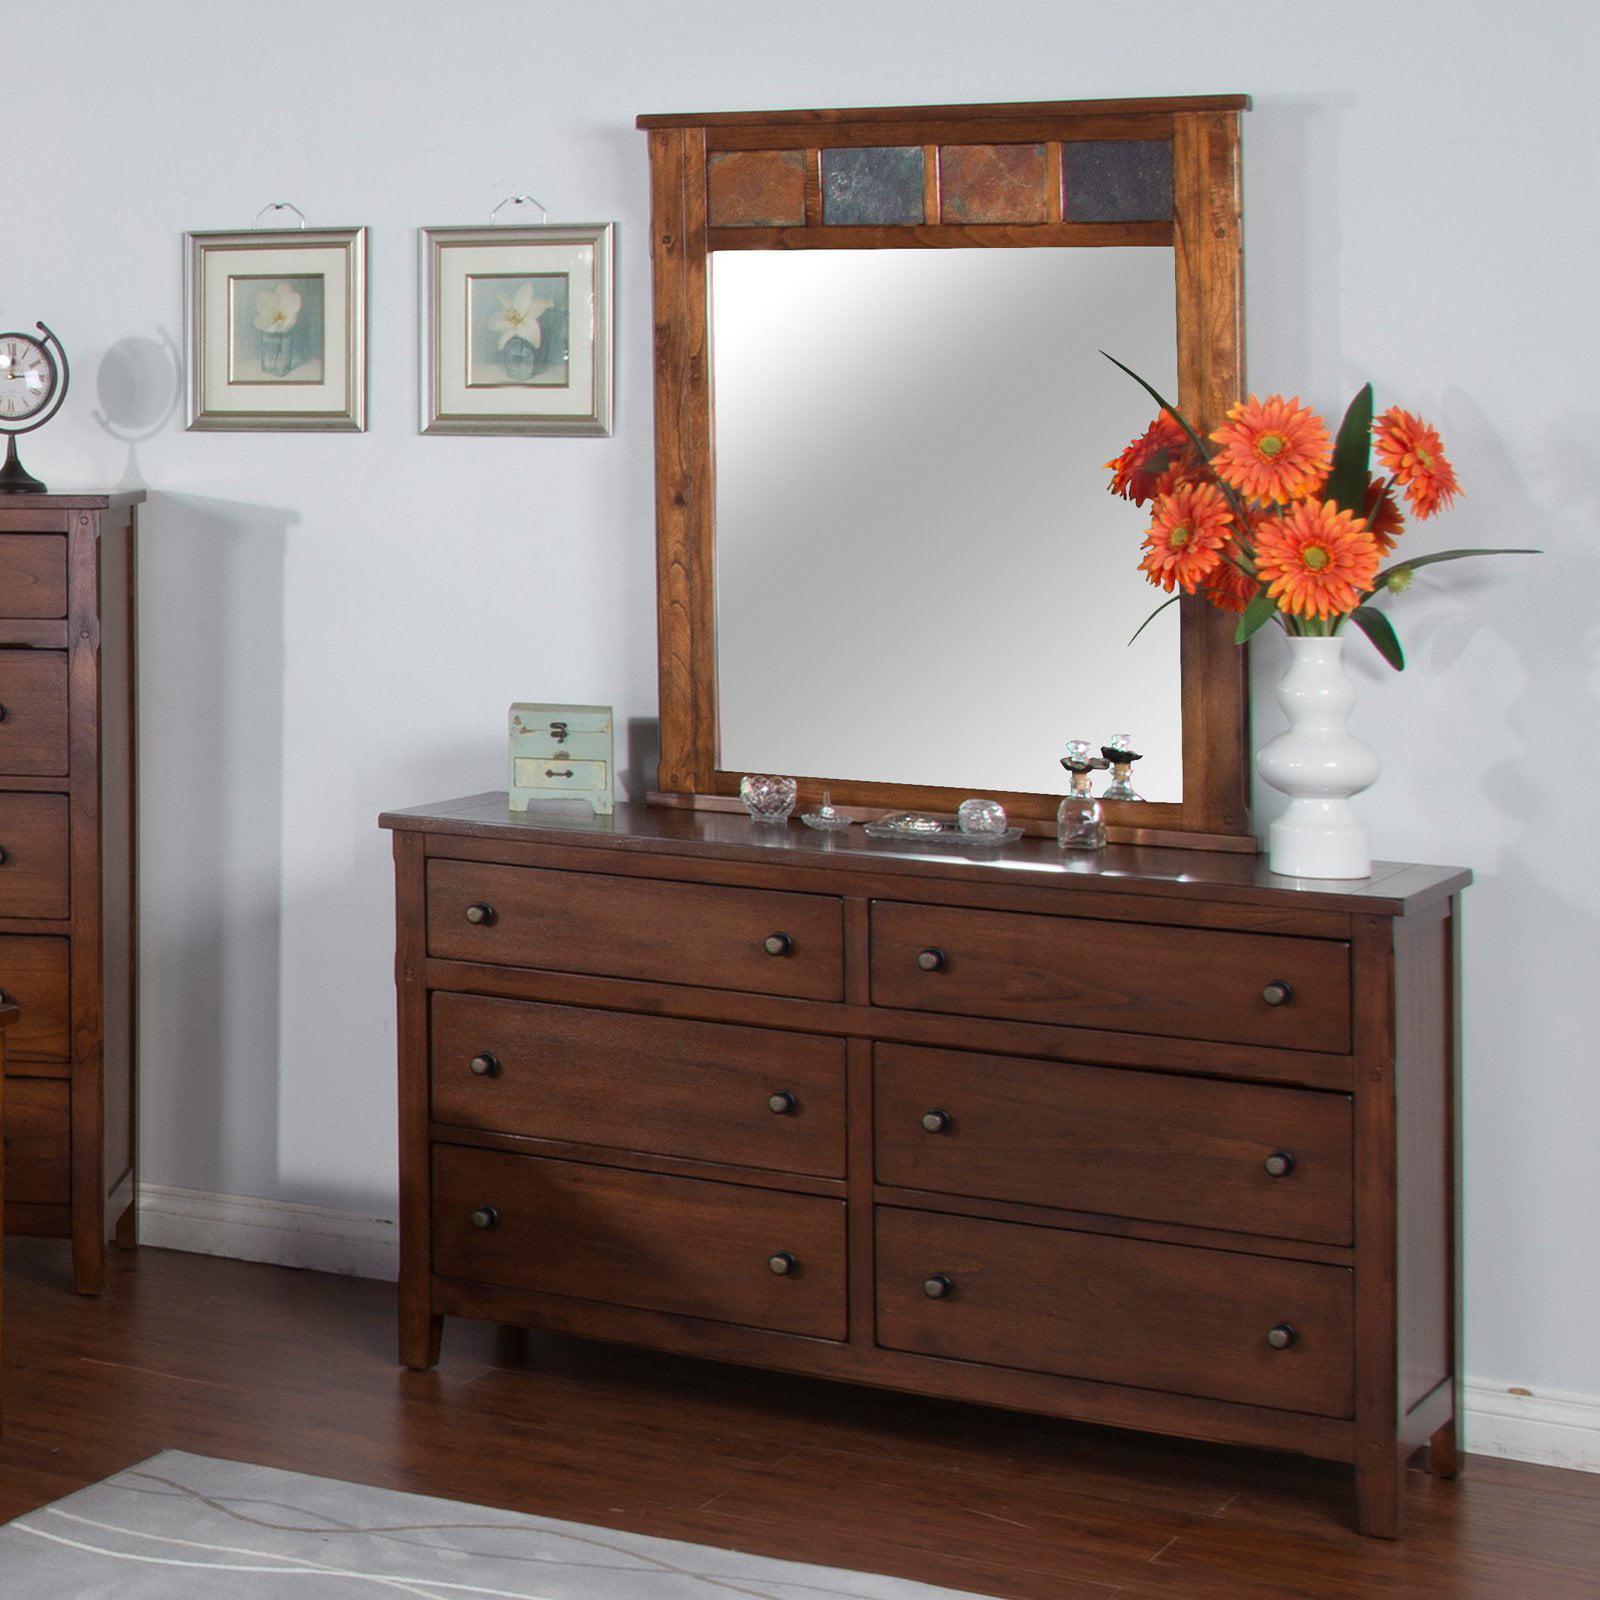 Sunny Designs Santa Fe 6 Drawer Dresser with Optional Mirror